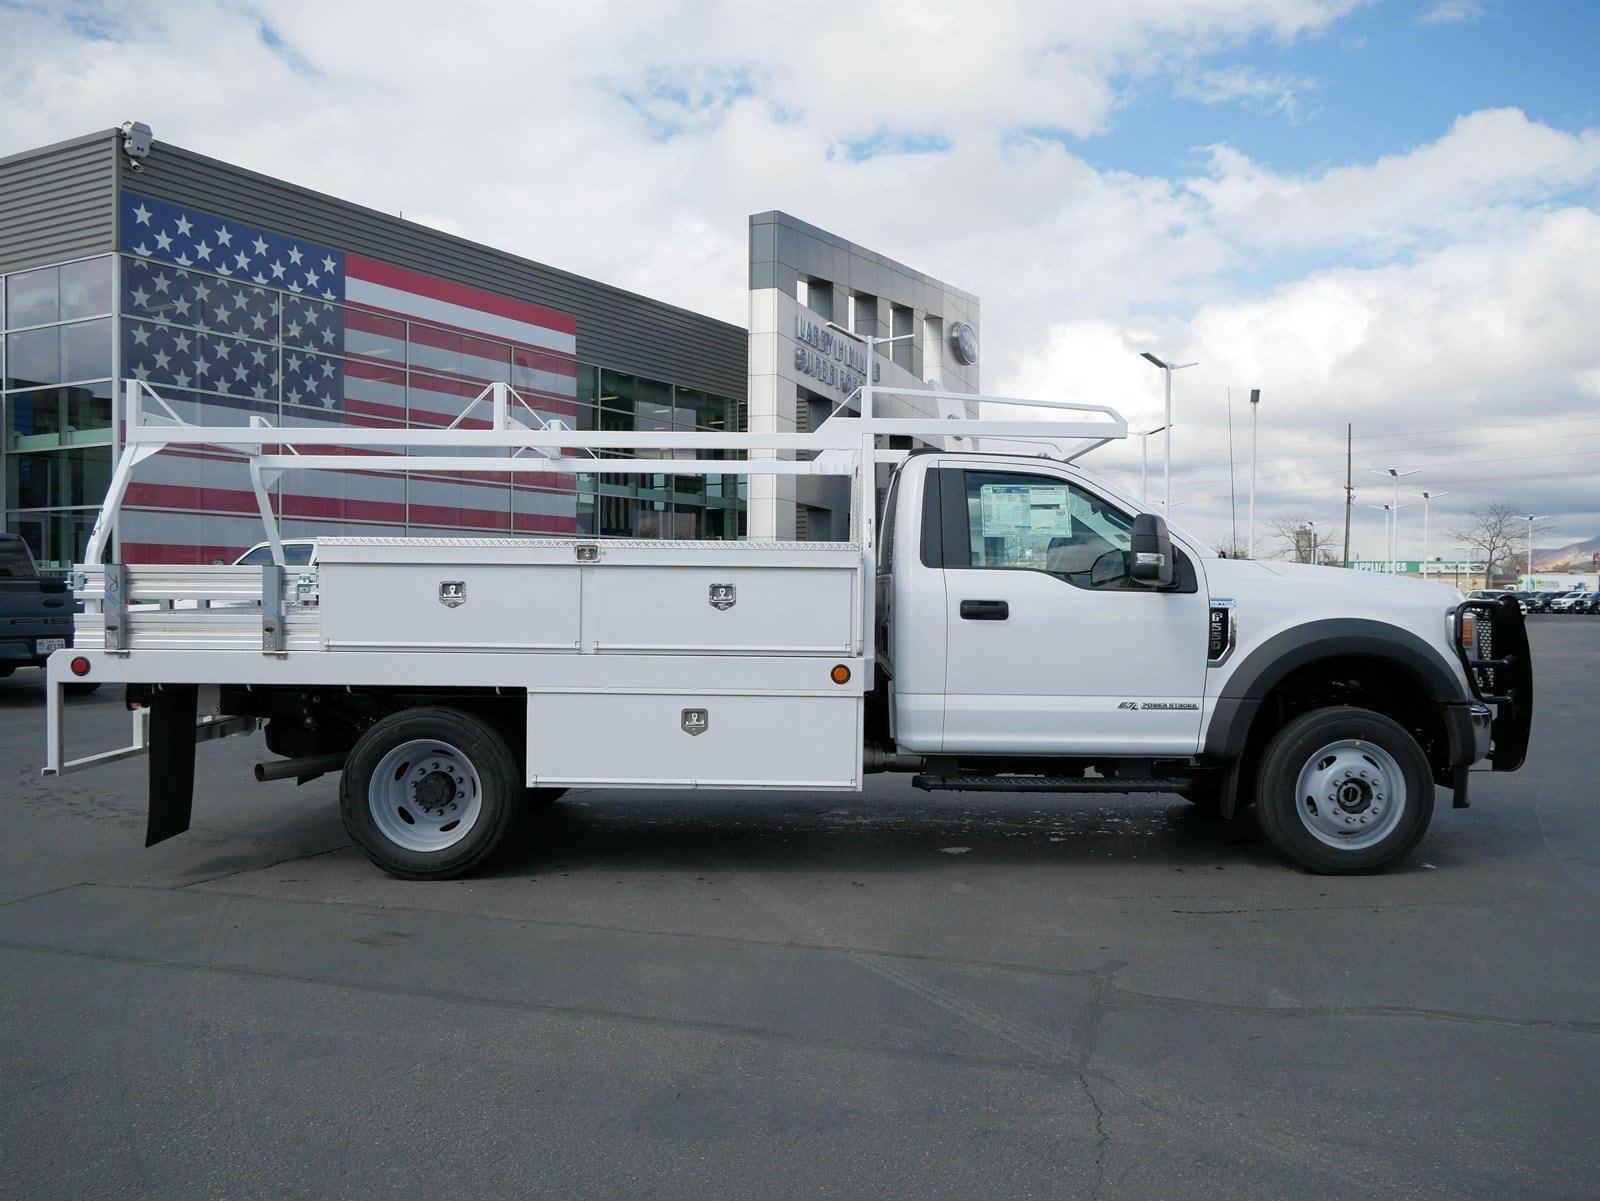 2020 F-550 Regular Cab DRW 4x4, Scelzi CTFB Contractor Body #63072 - photo 4